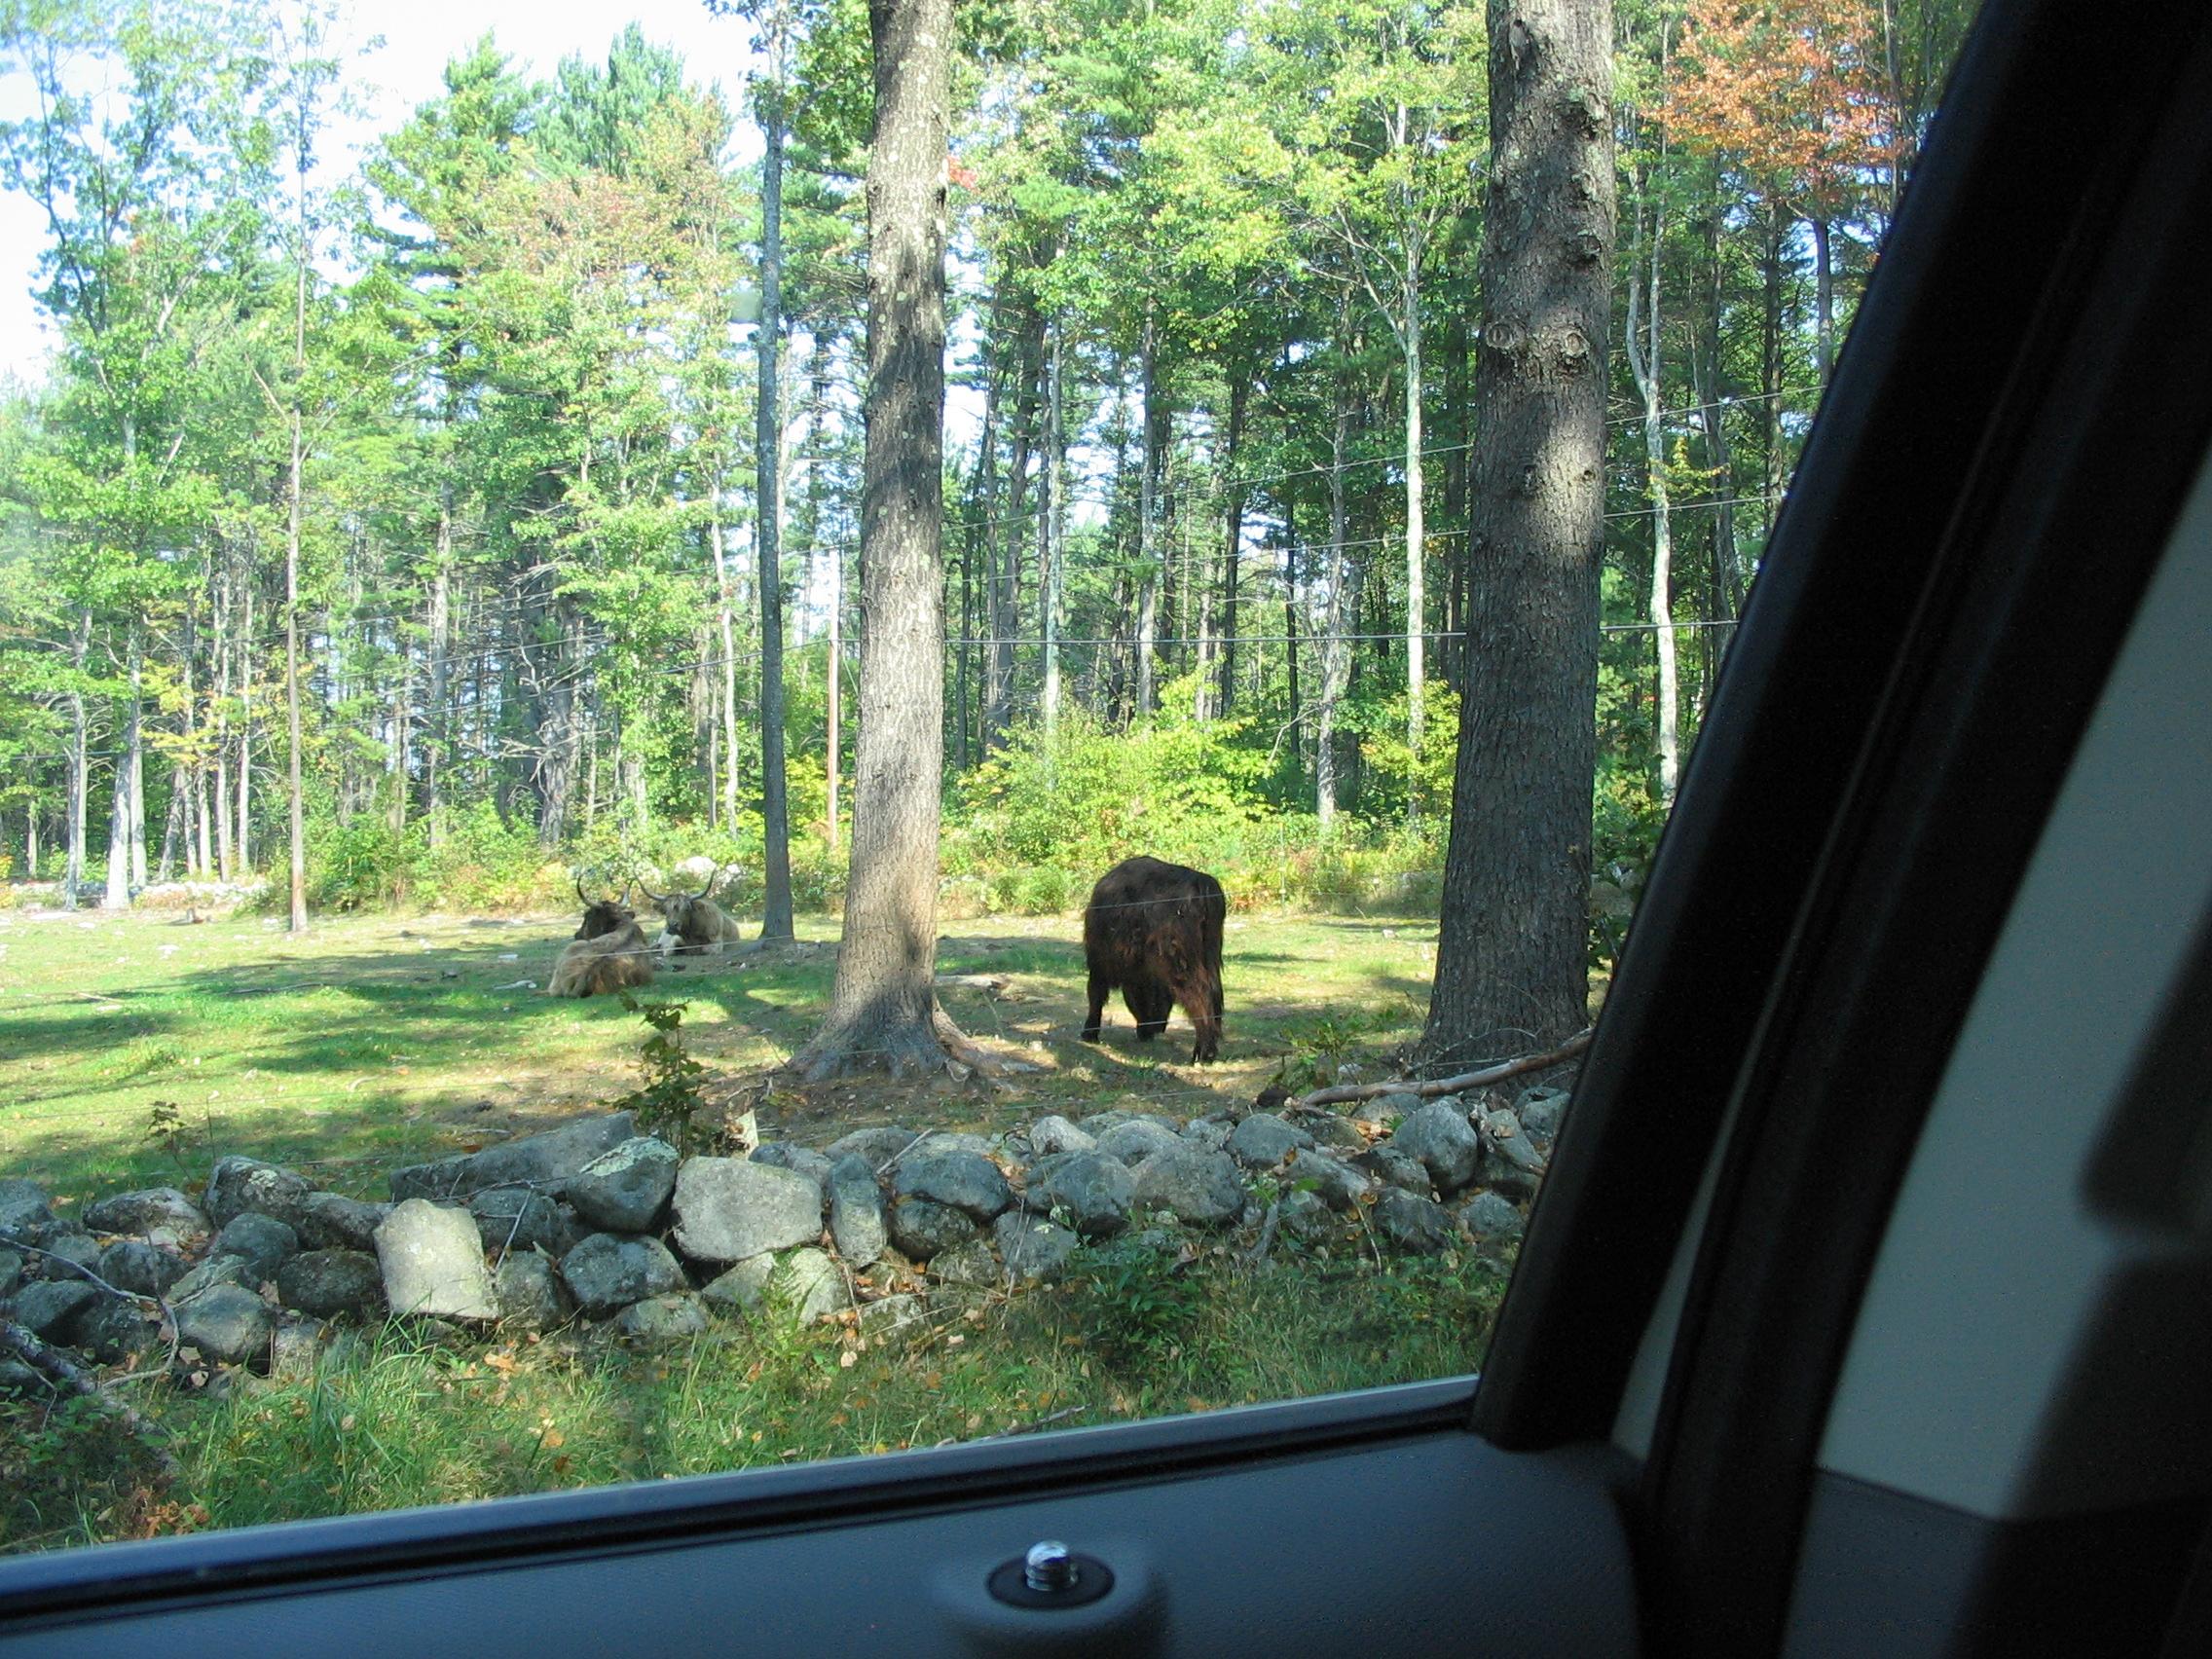 09-26-07 New Hampshire (7)